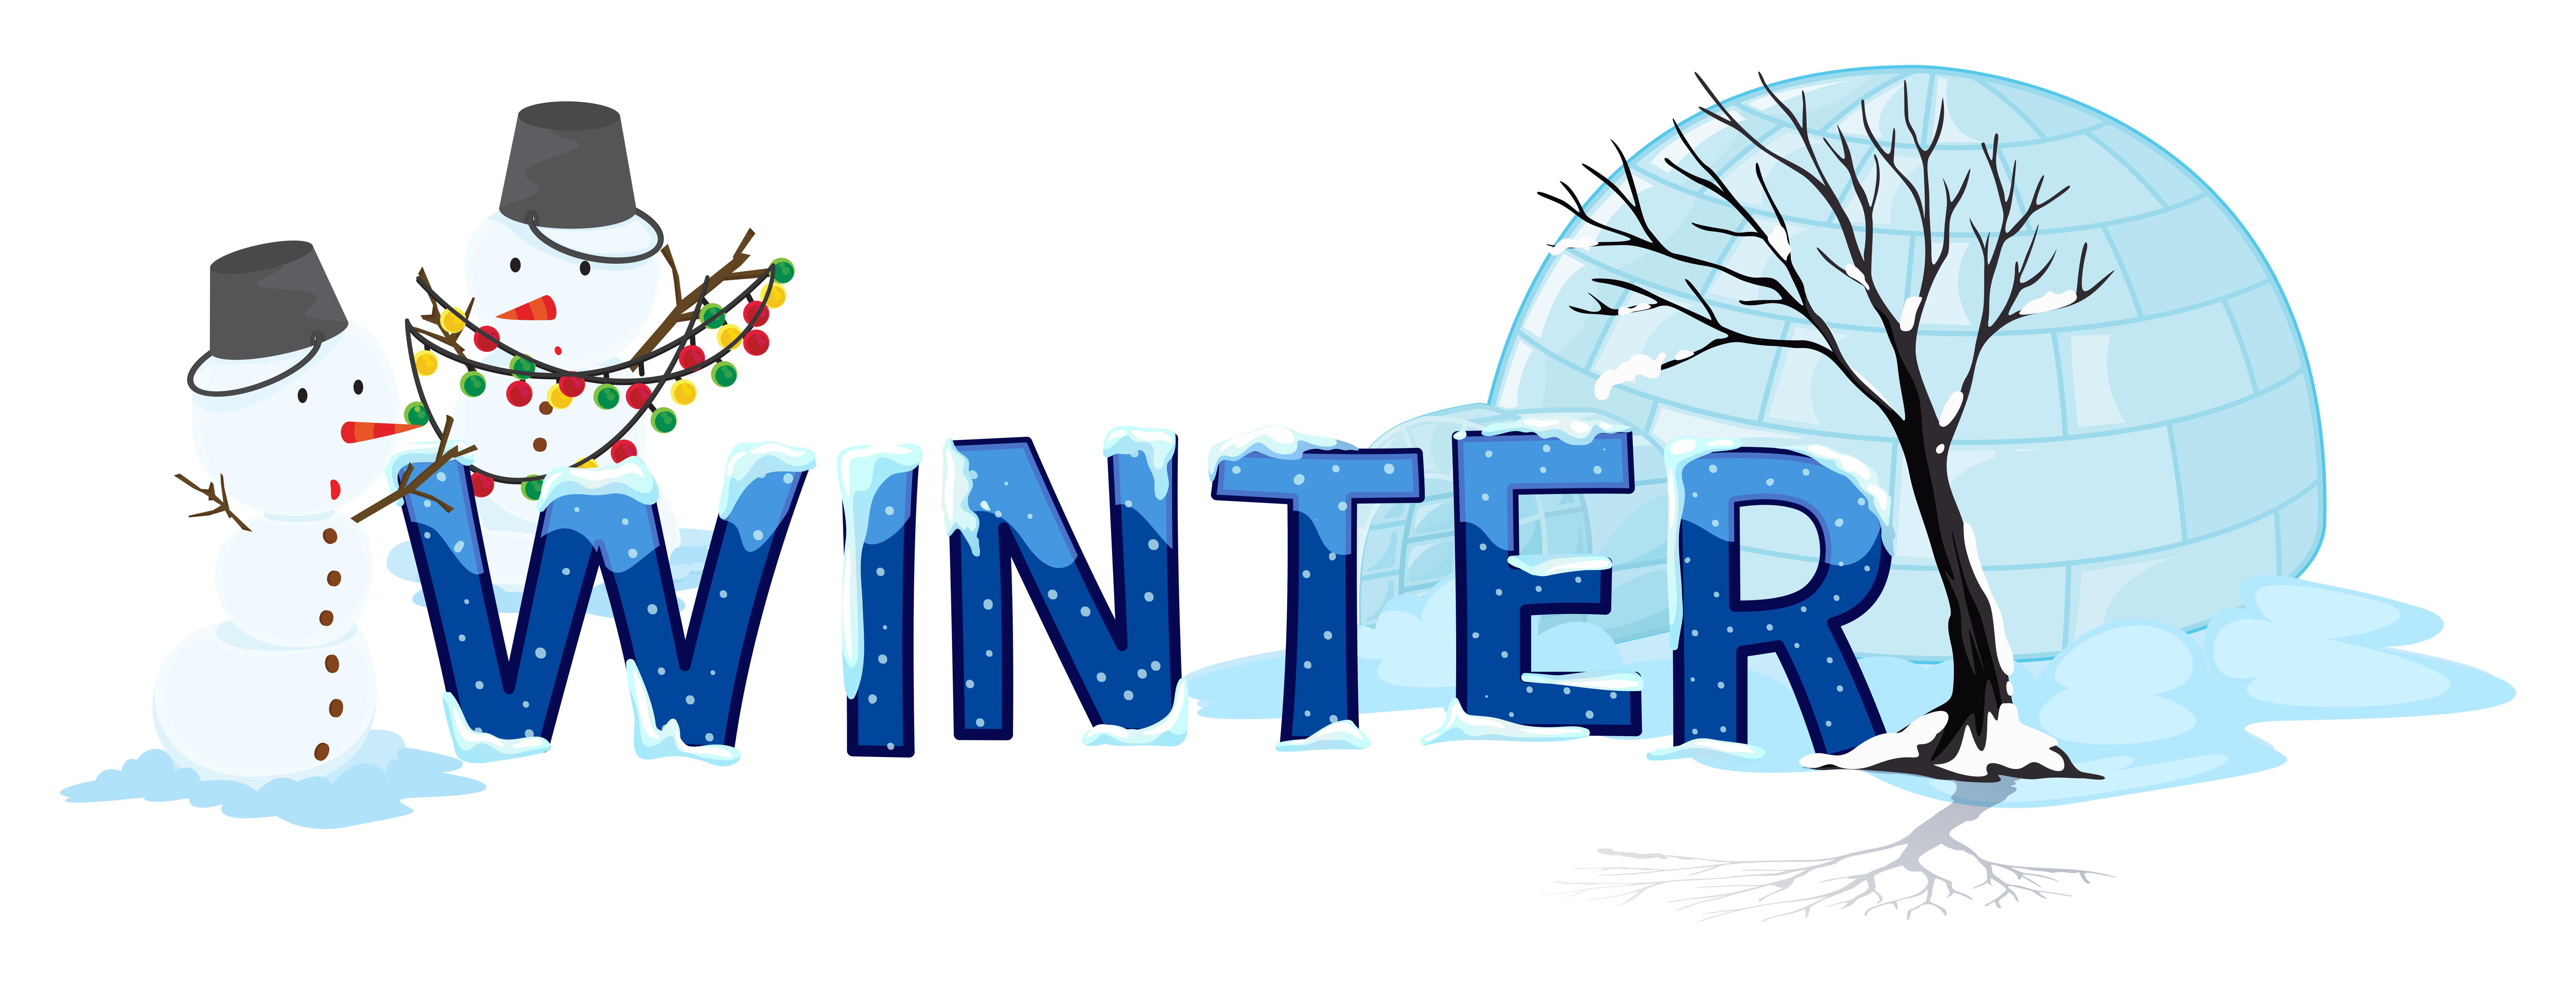 font design with word winter download free vector art. Black Bedroom Furniture Sets. Home Design Ideas